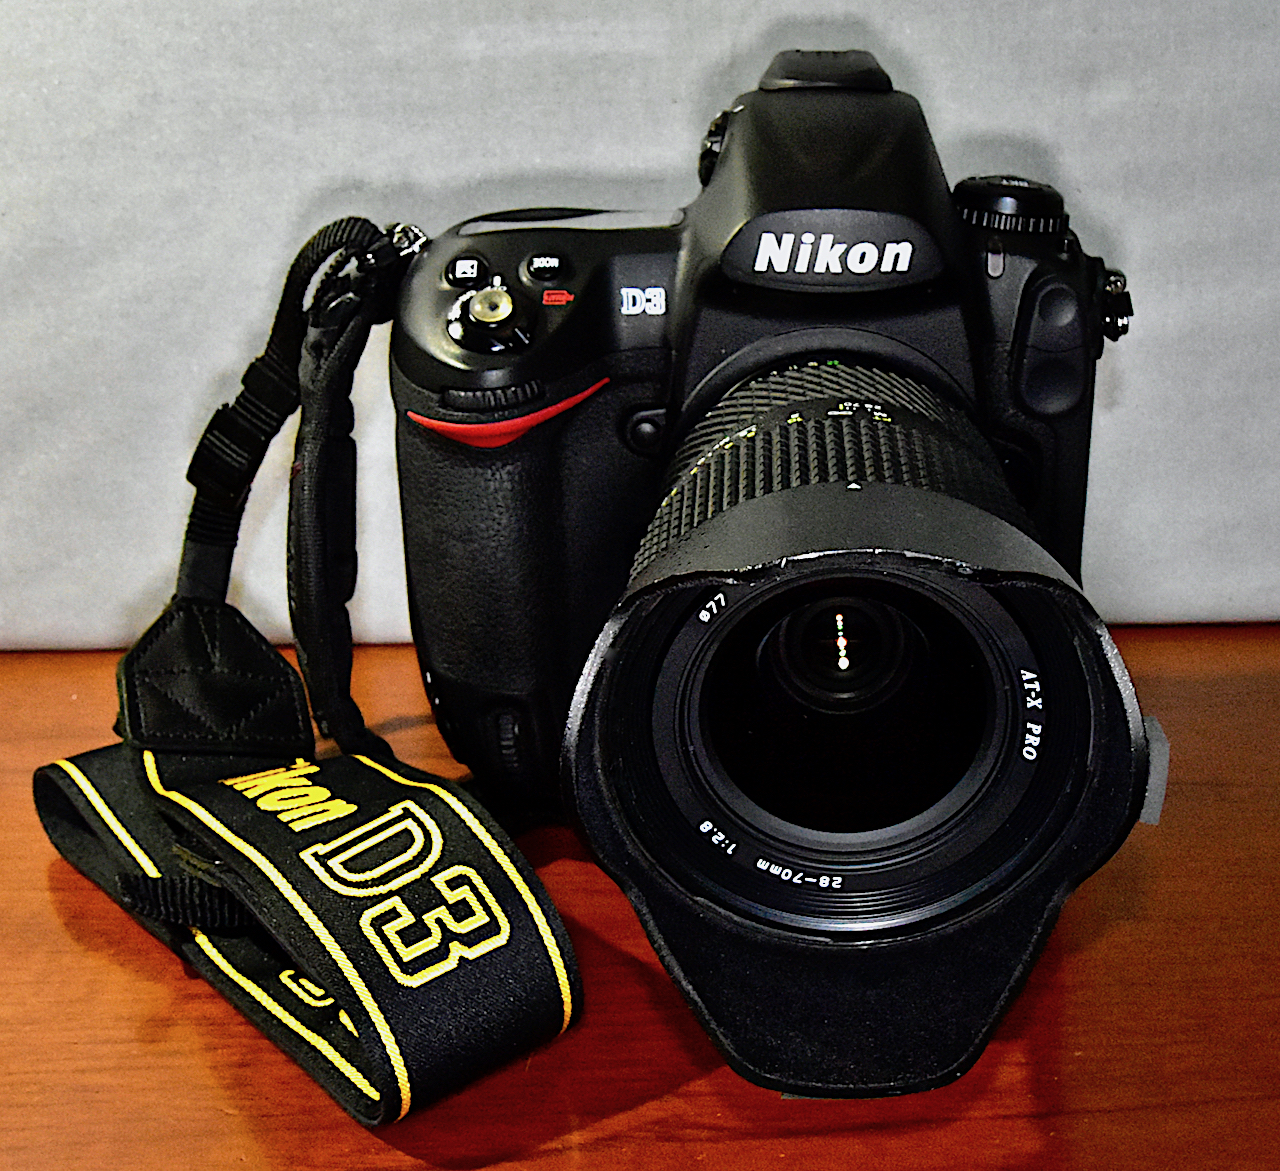 Nikon AN-D3 Strap for Nikon D3 DSLR Camera